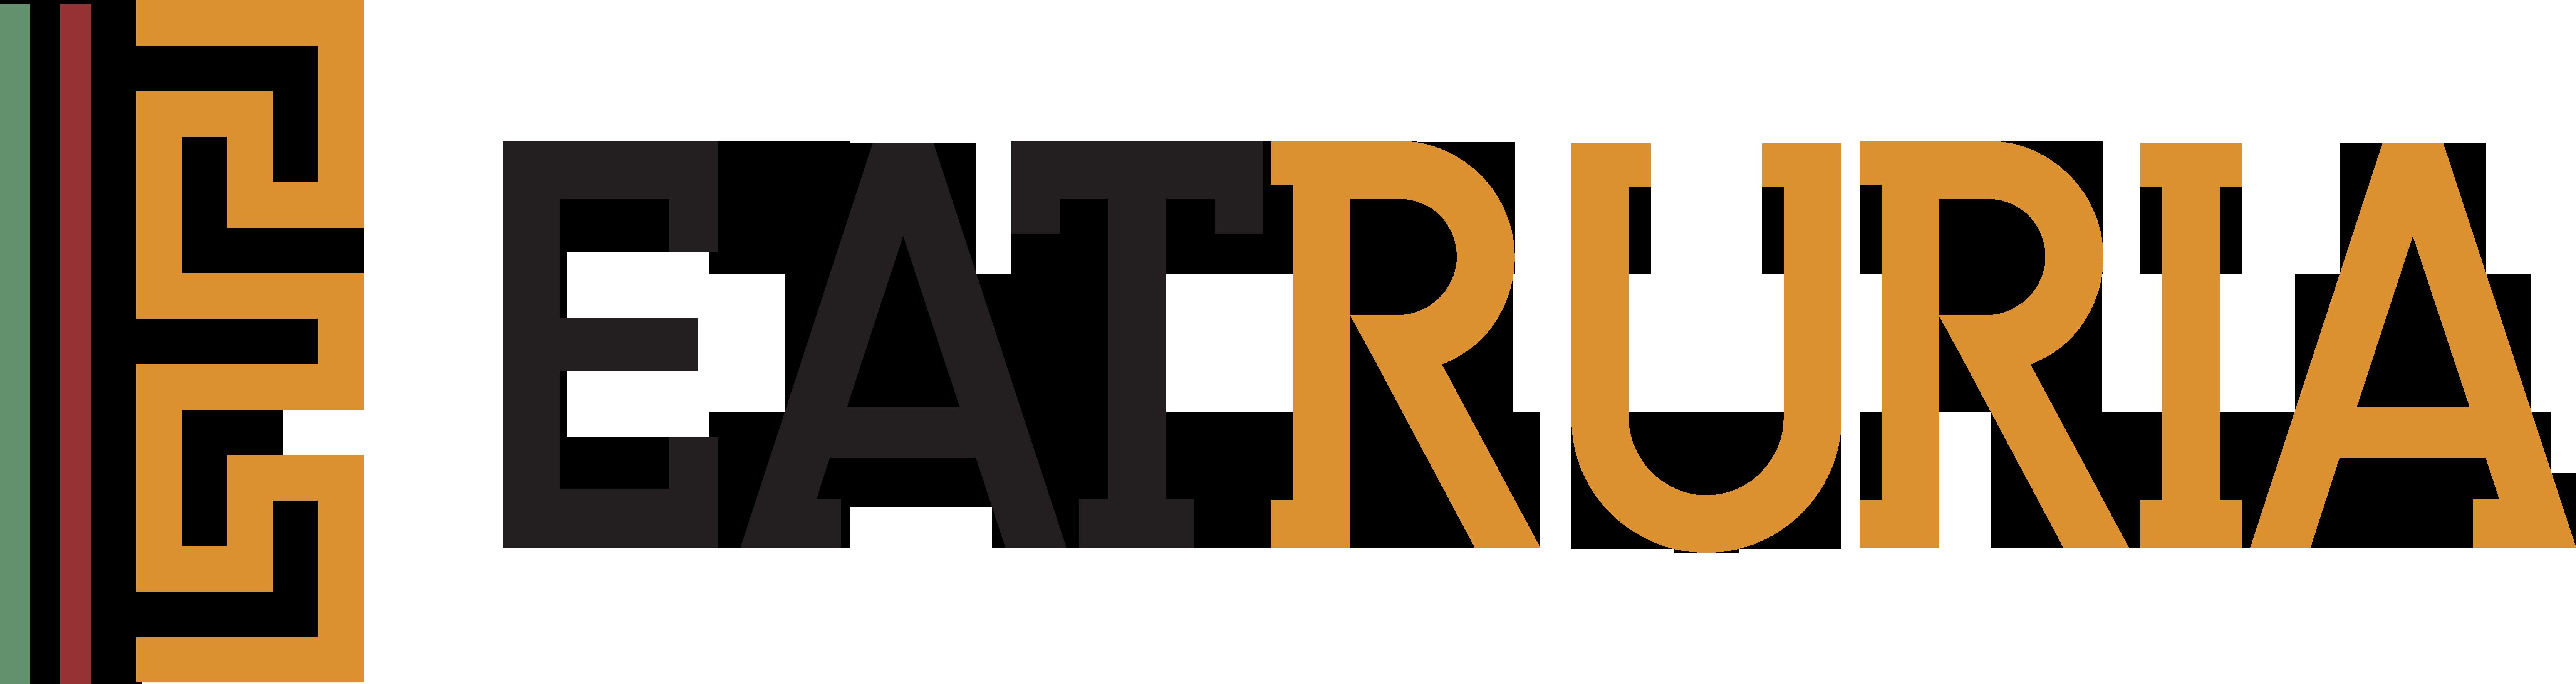 Eatruria